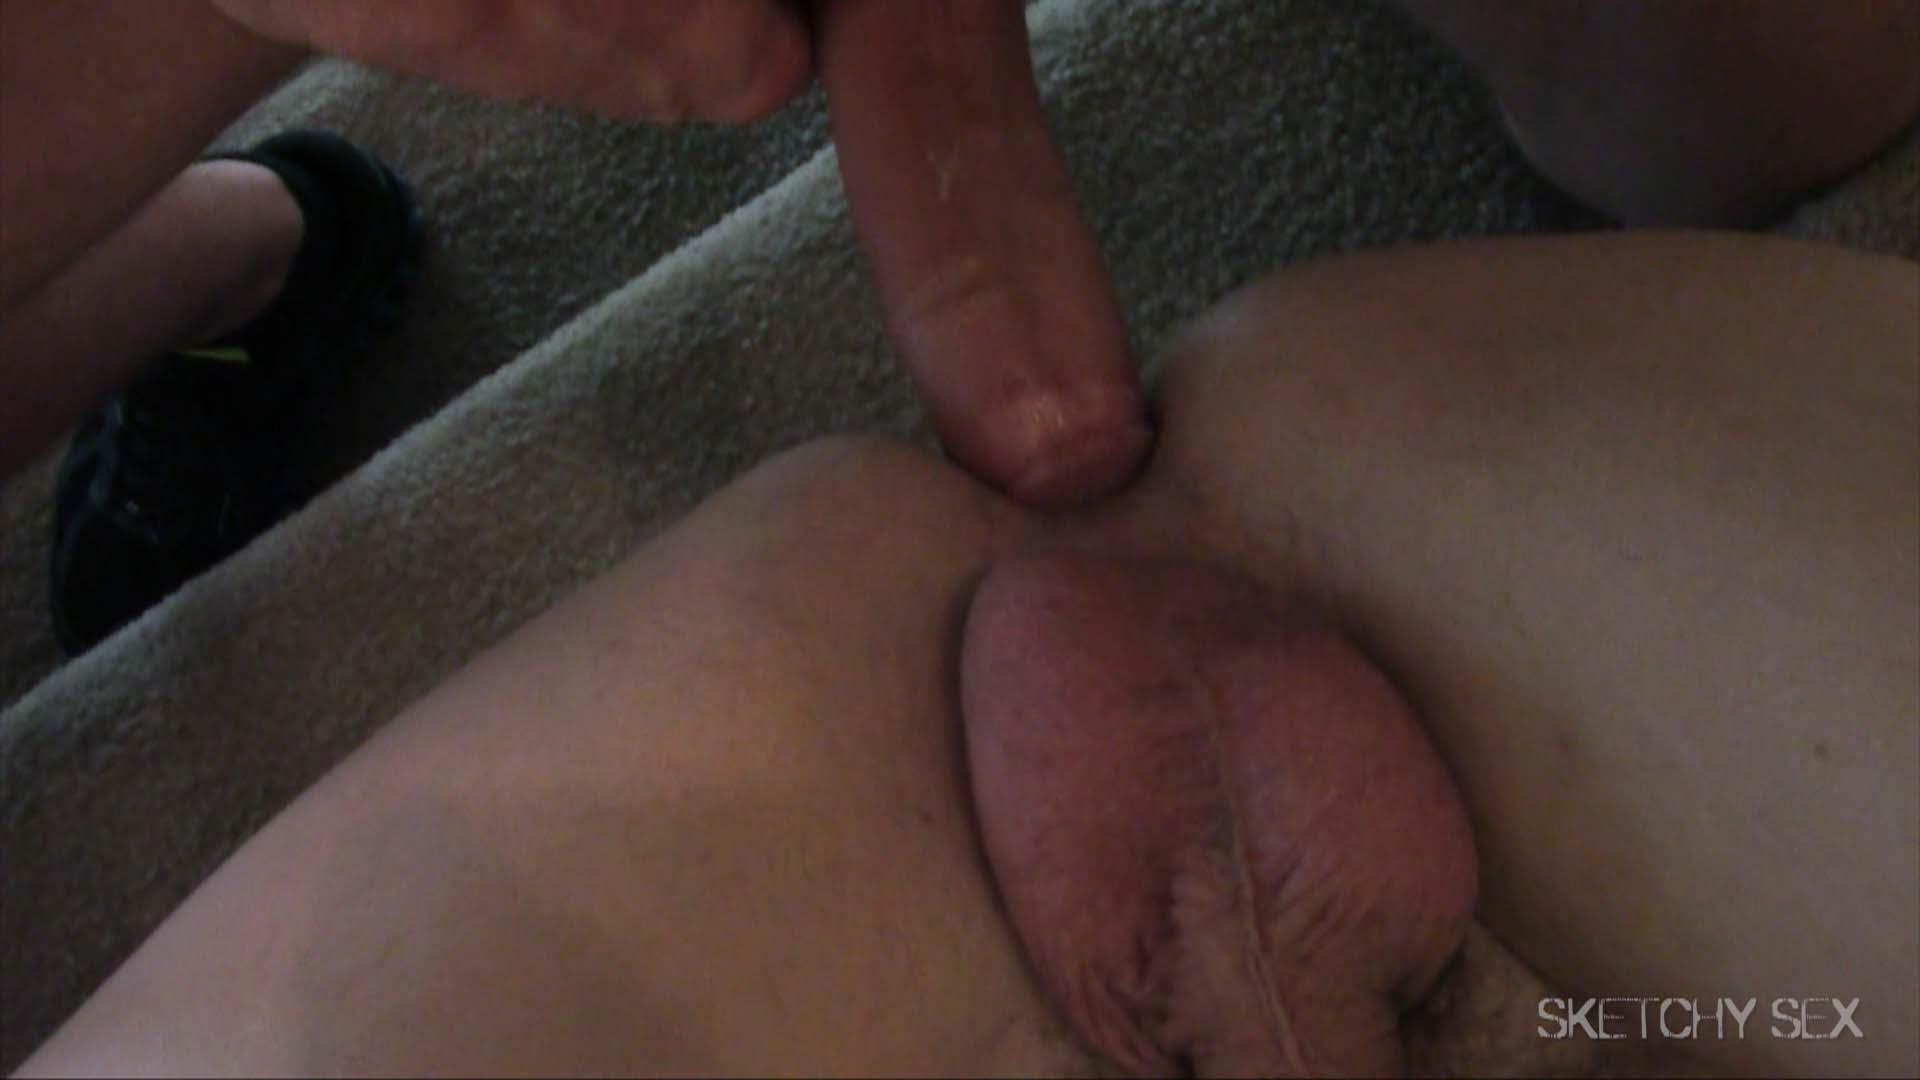 Sketchy-Sex-Bareback-Breeding-Anonymous-Sex-Amateur-Gay-Porn-07 Three Hung Guys Breeding A Slutty Jock Hole